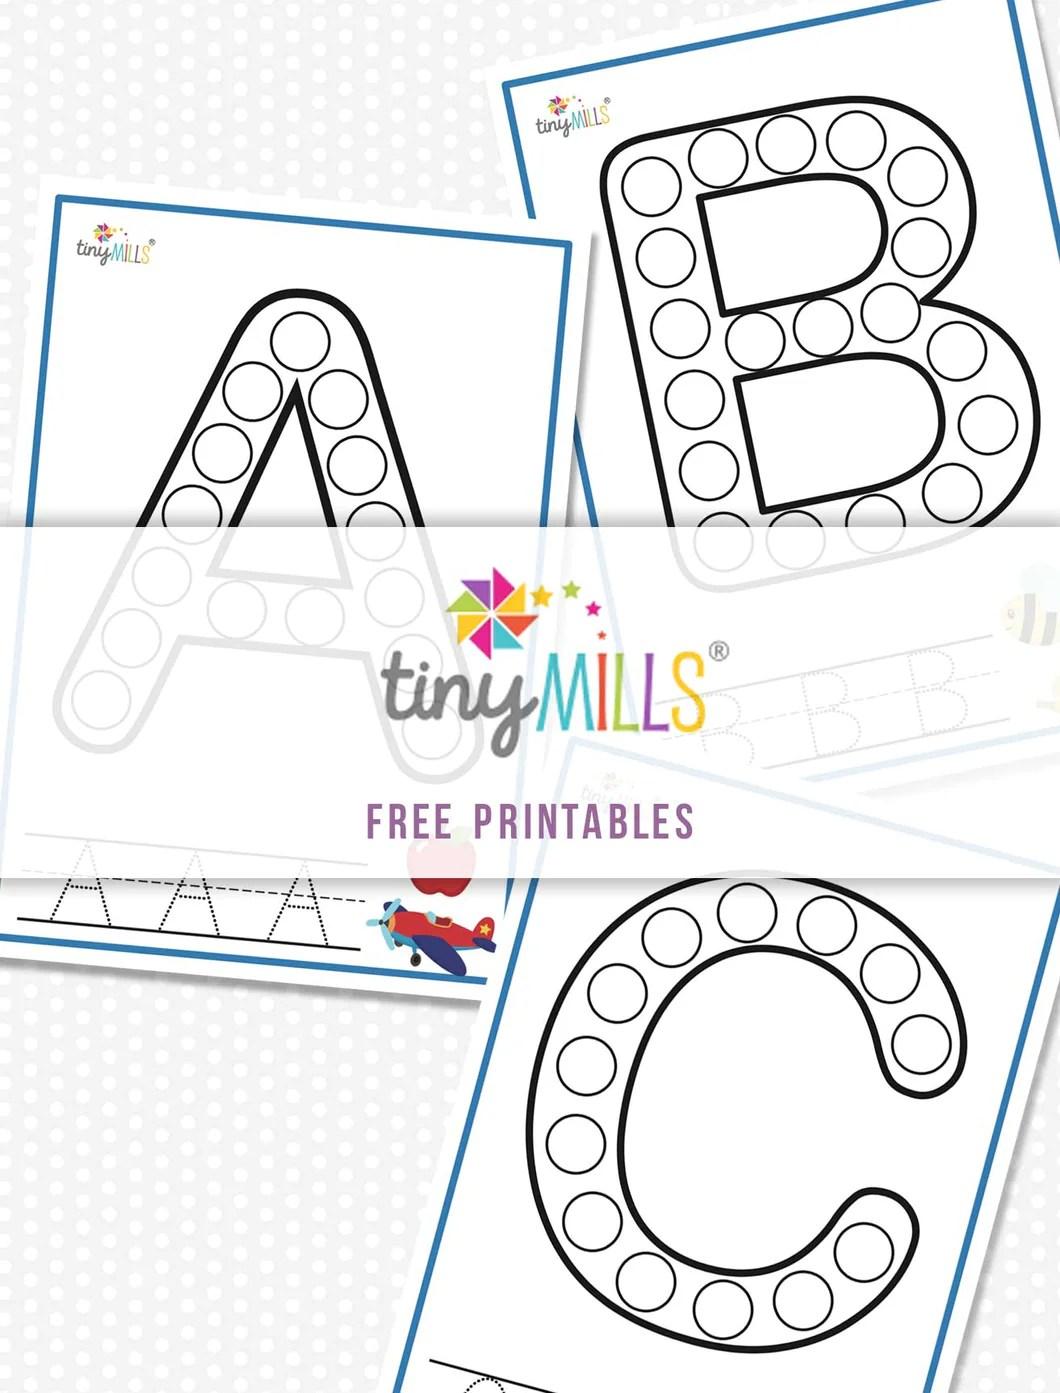 Free Printable Stamp \u0026 Count ABC Worksheet (Full 26 Alphabet) - Tiny Mills® [ 1393 x 1060 Pixel ]